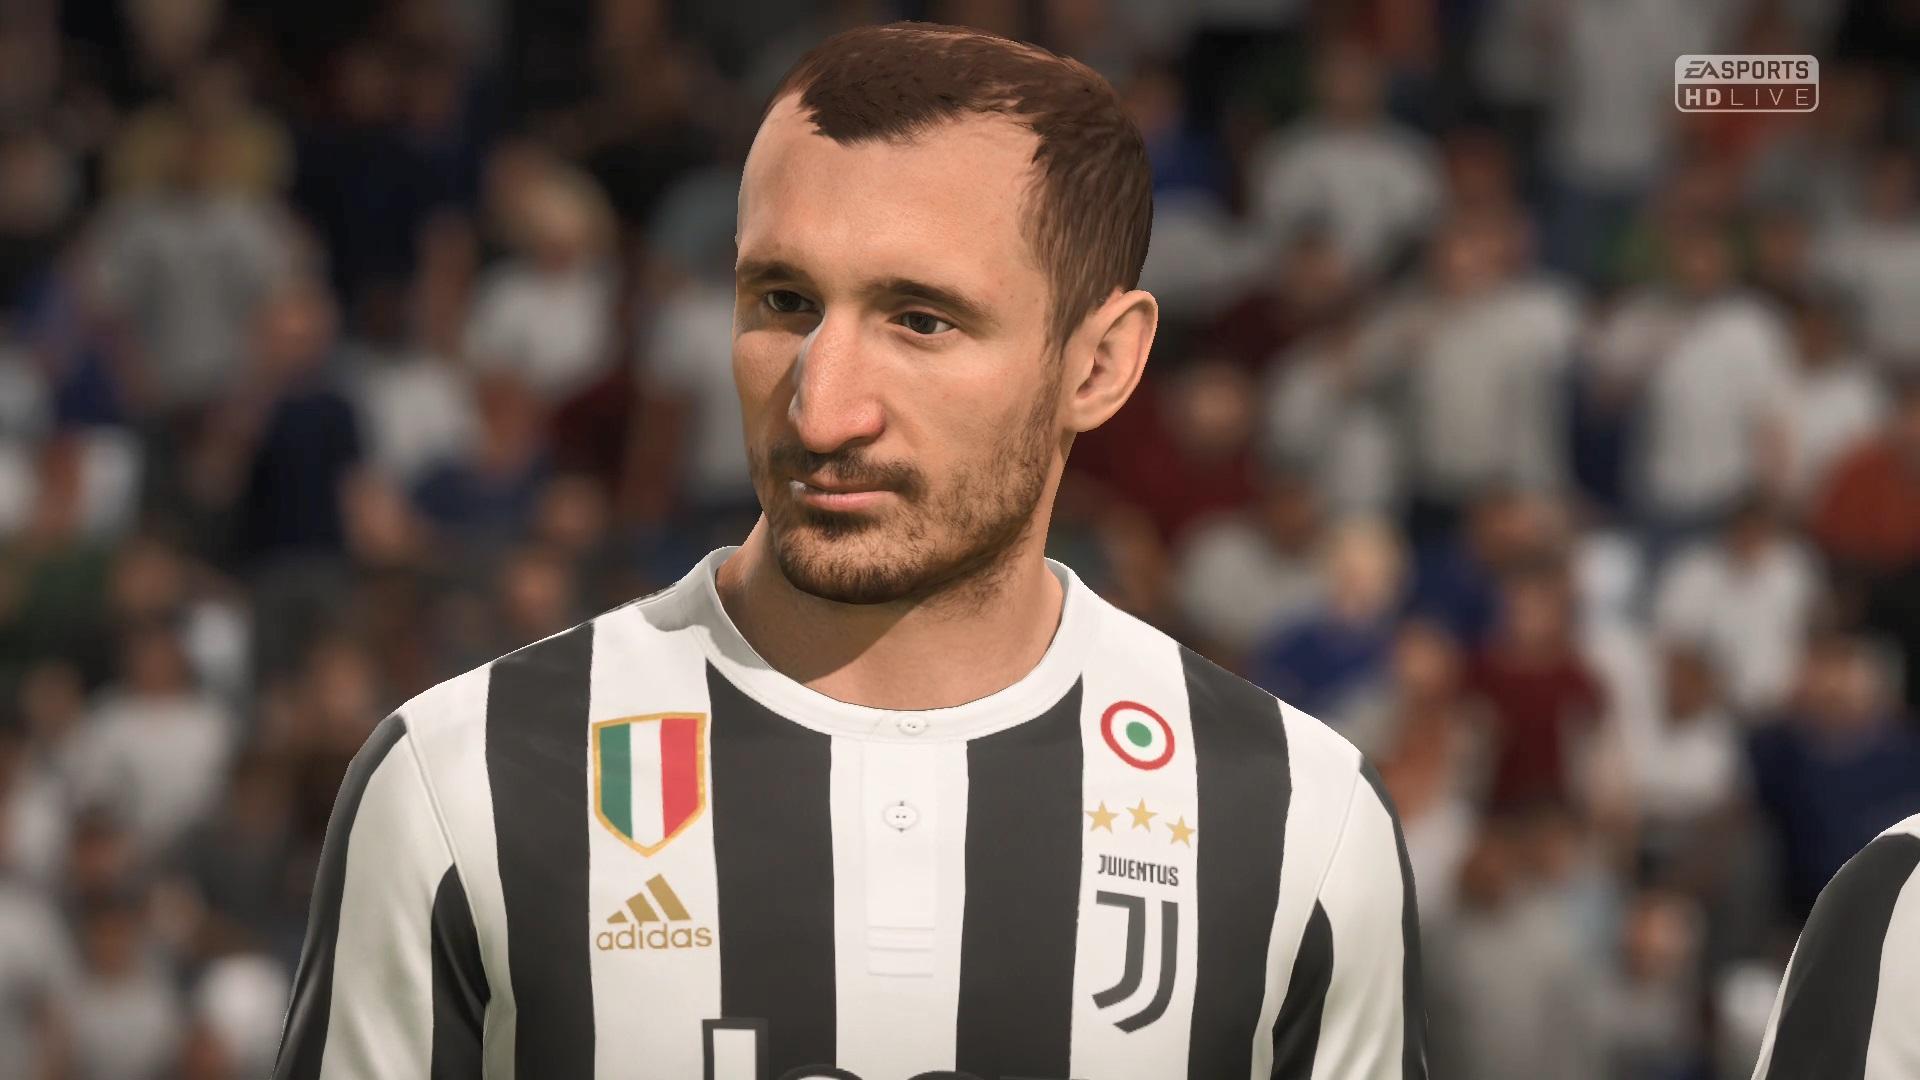 FIFA 18 Demo Highlights 5